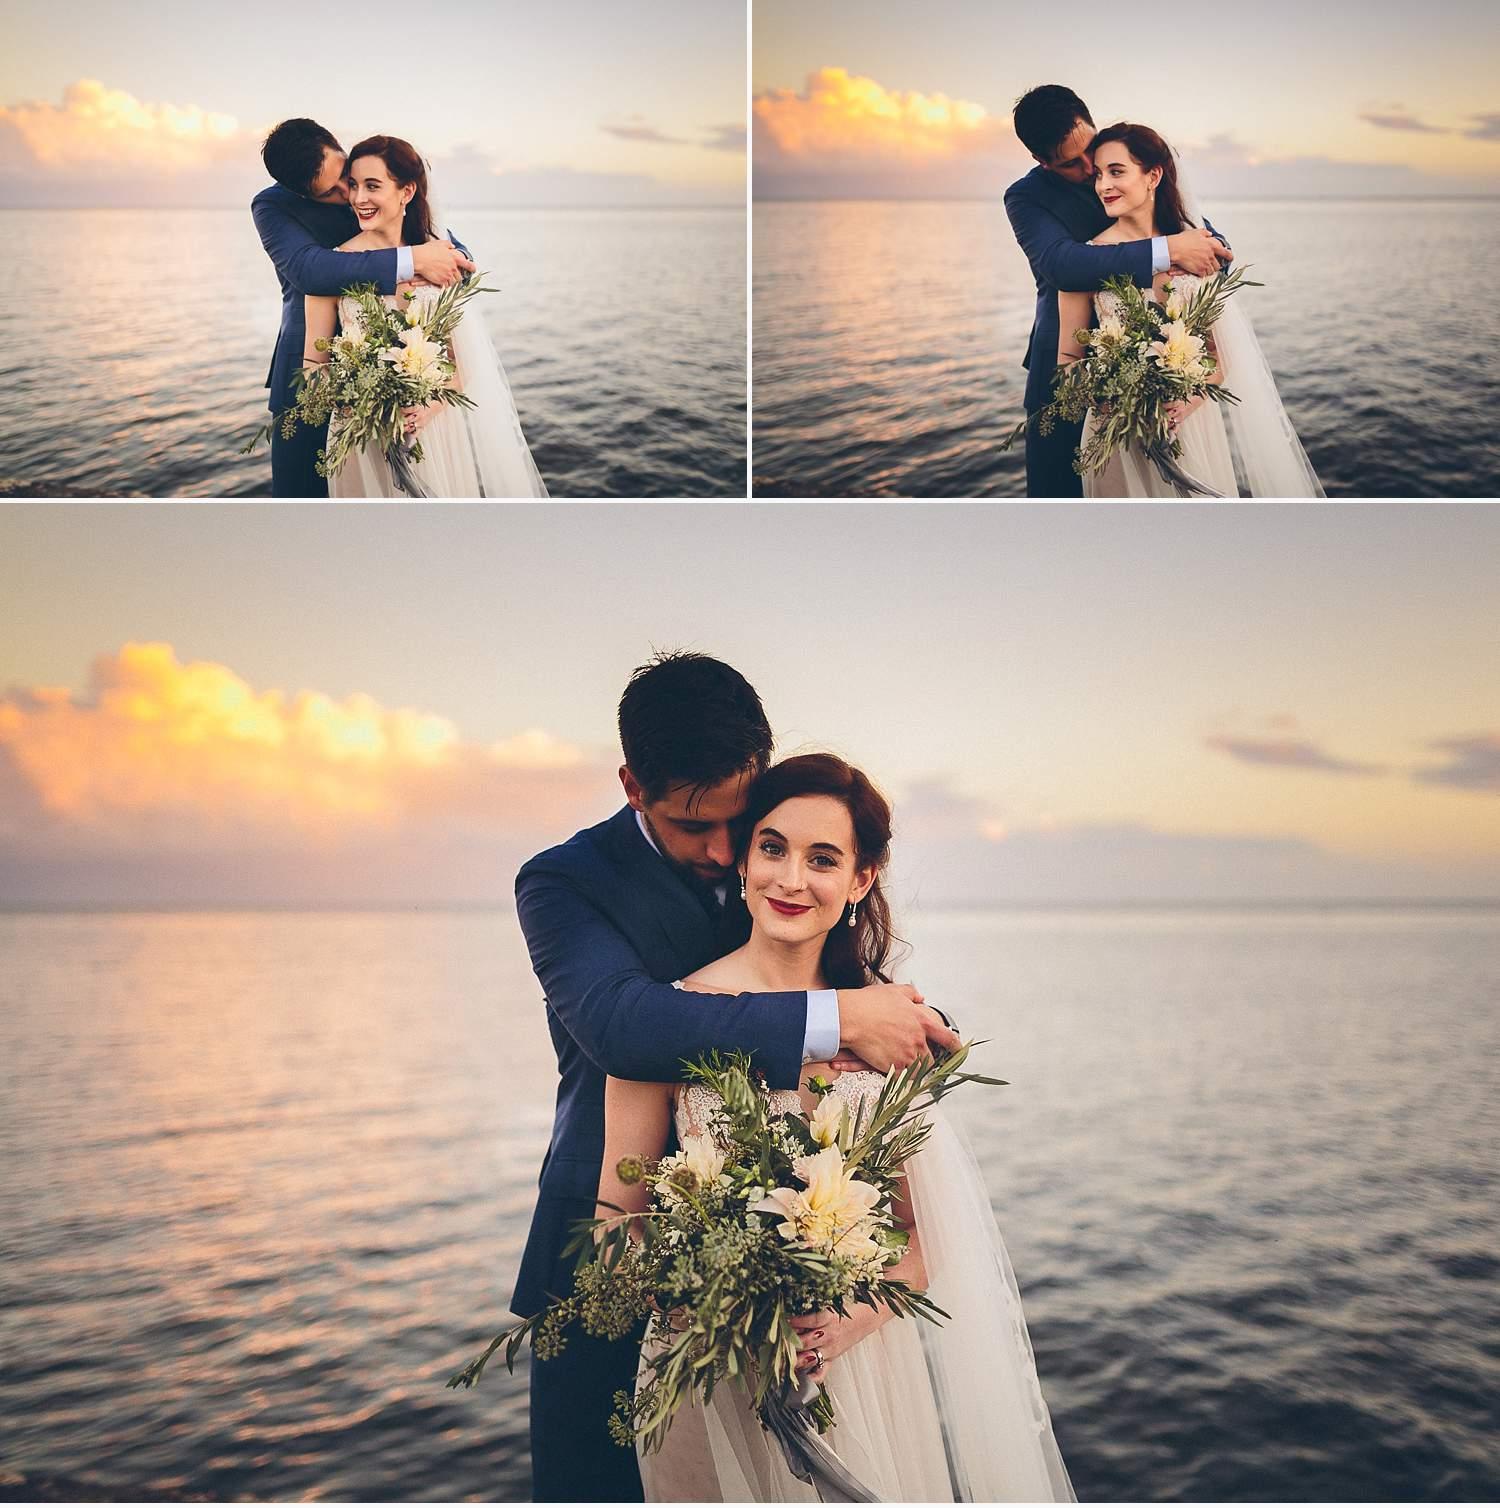 deering-estate-wedding-photographer-daniel-lateulade-019.JPG